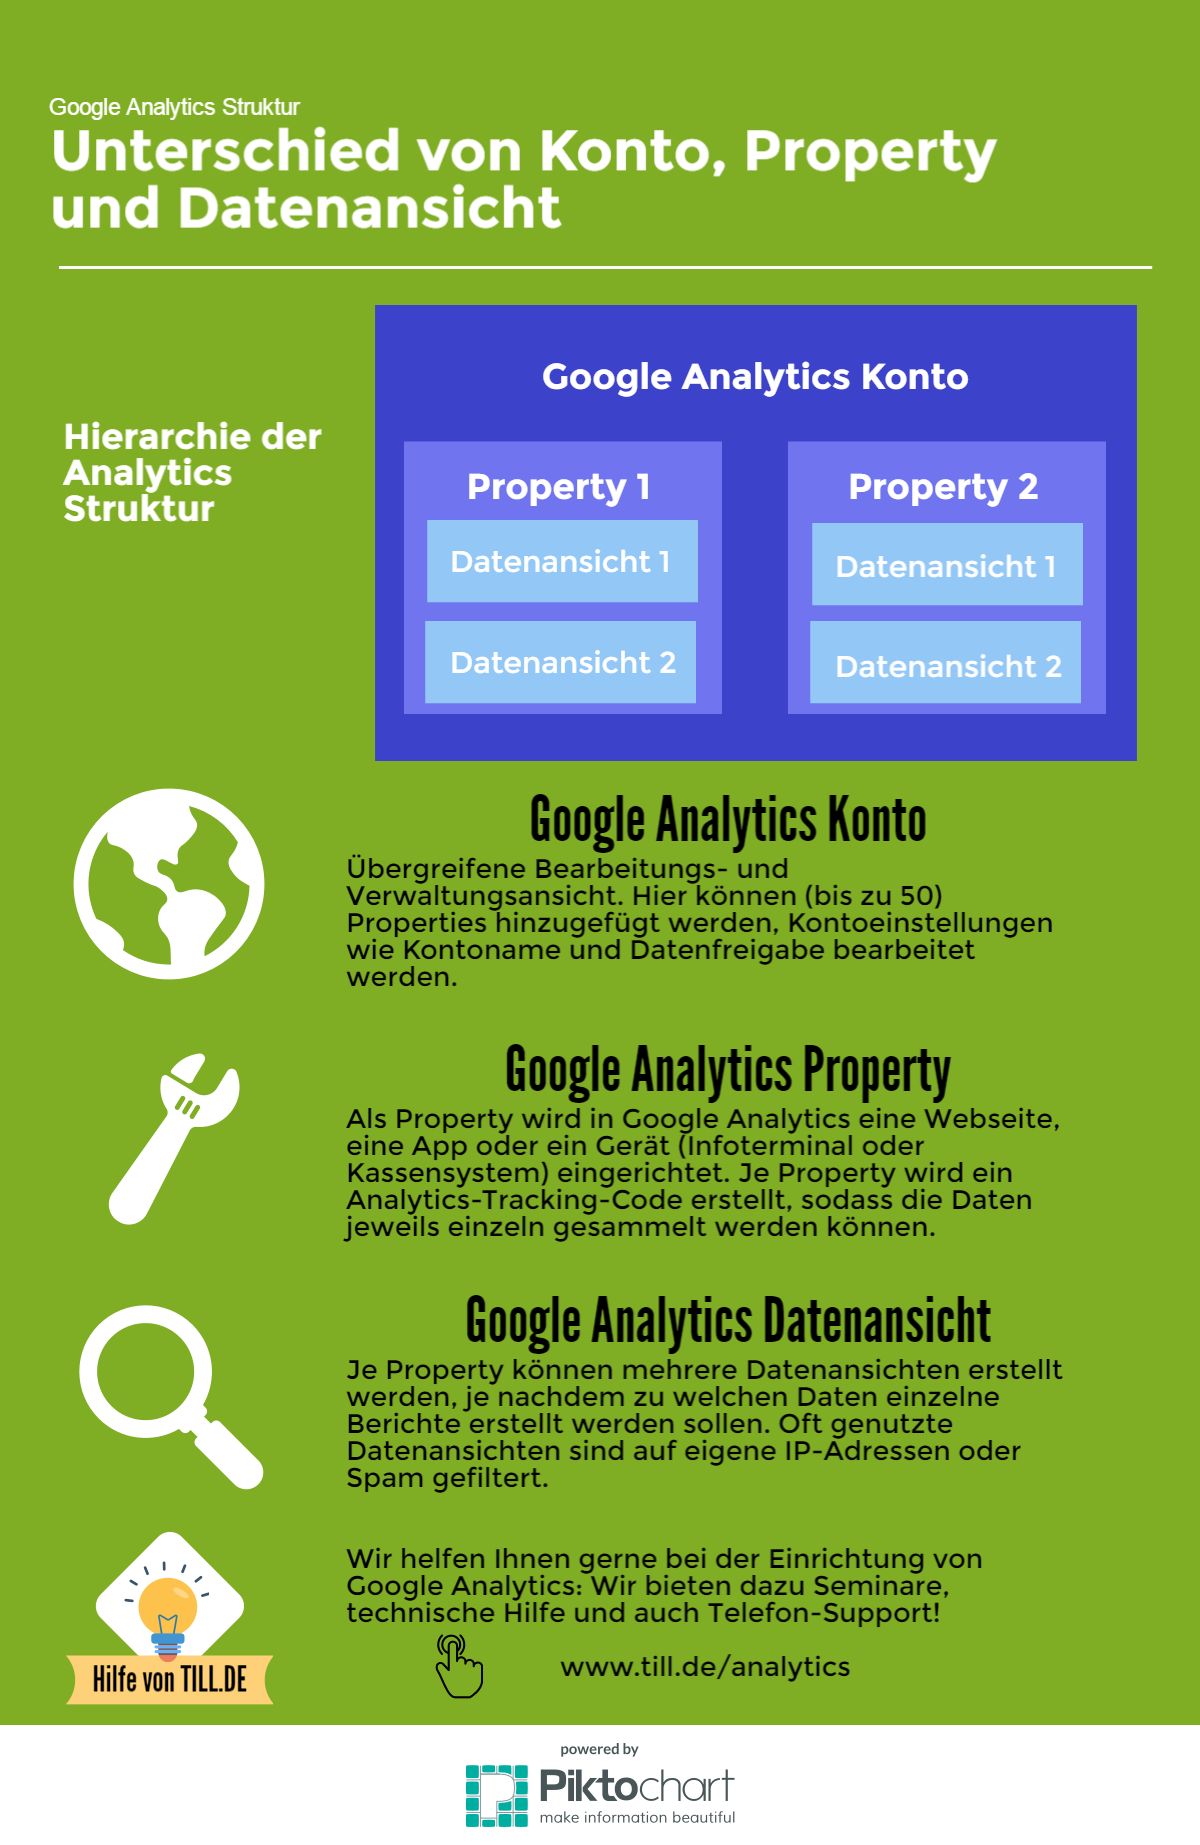 TILL.DE-Infographic-Google-Analytics_Konto_Property_Datenansicht Google Analytics Struktur: Analytics Konto, Property und Datenansicht